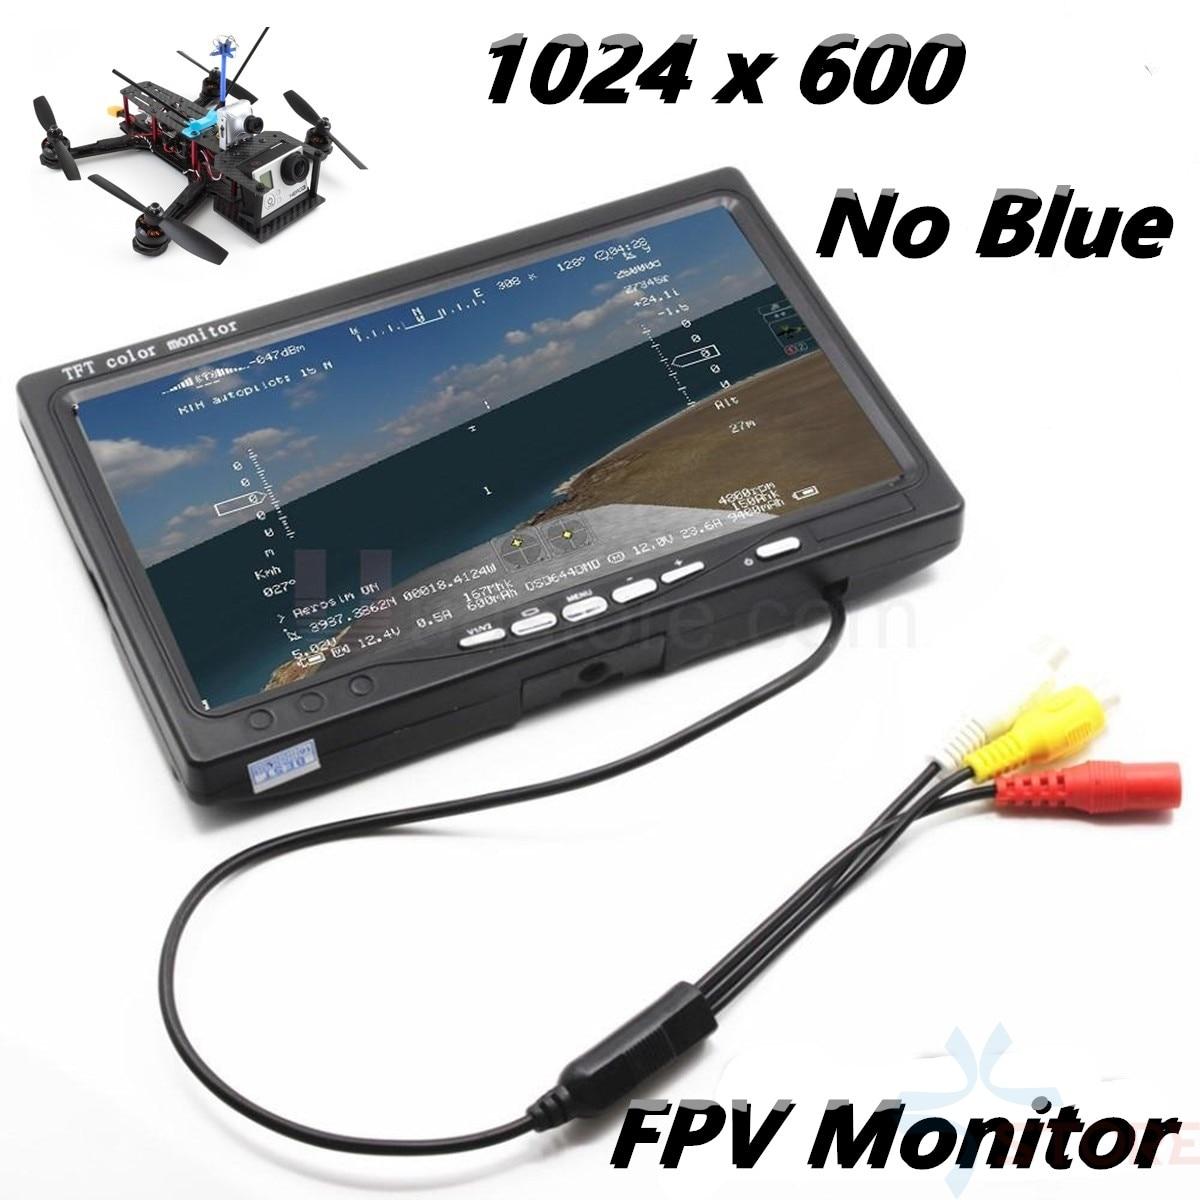 7 zoll LCD TFT FPV Monitor 1024x600 w/T Screen Keine blau FPV Monitor Photography für Bodenstation Phantom RC Modell QAV250